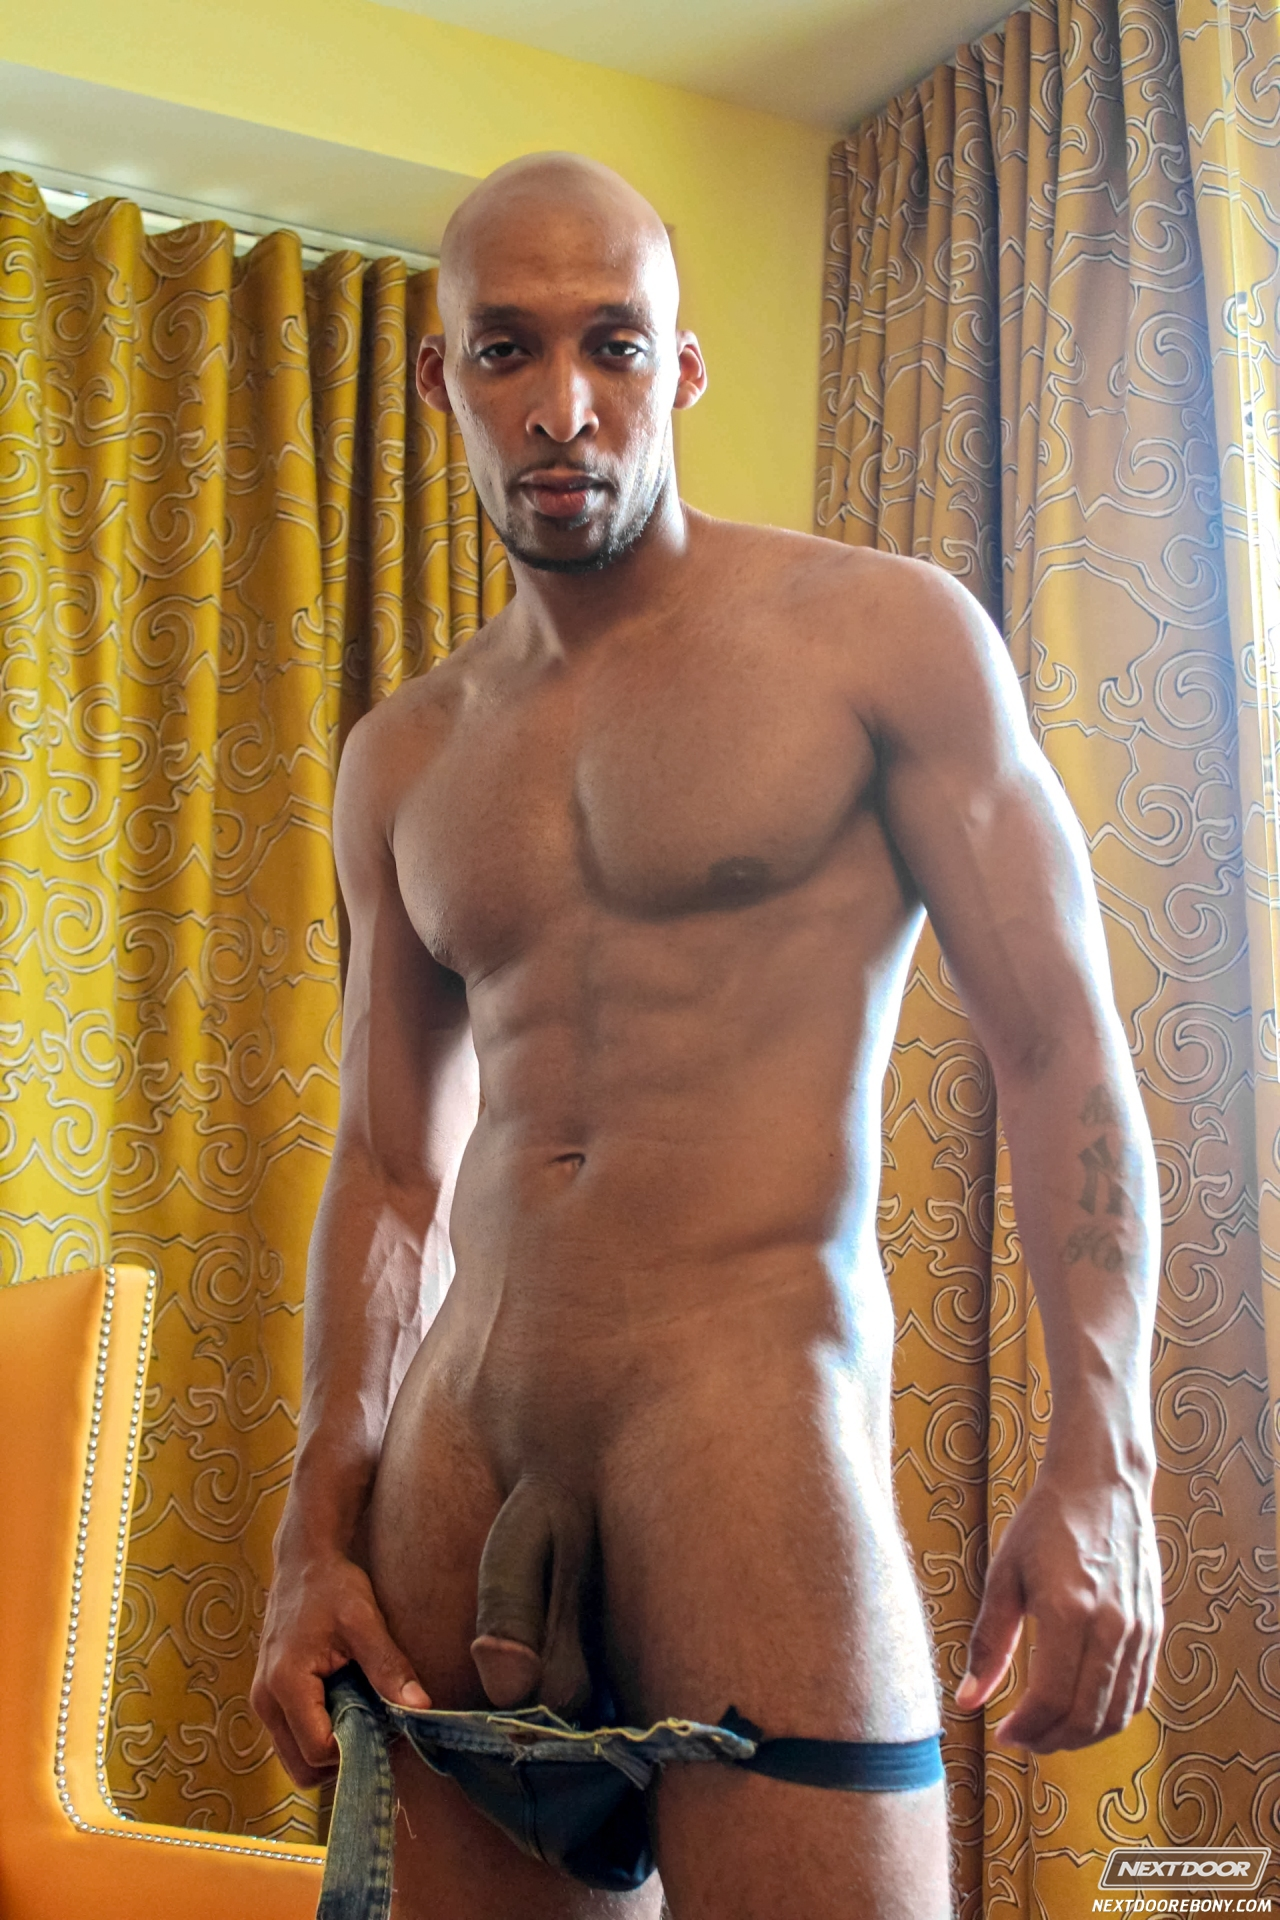 golie-muskulistie-negri